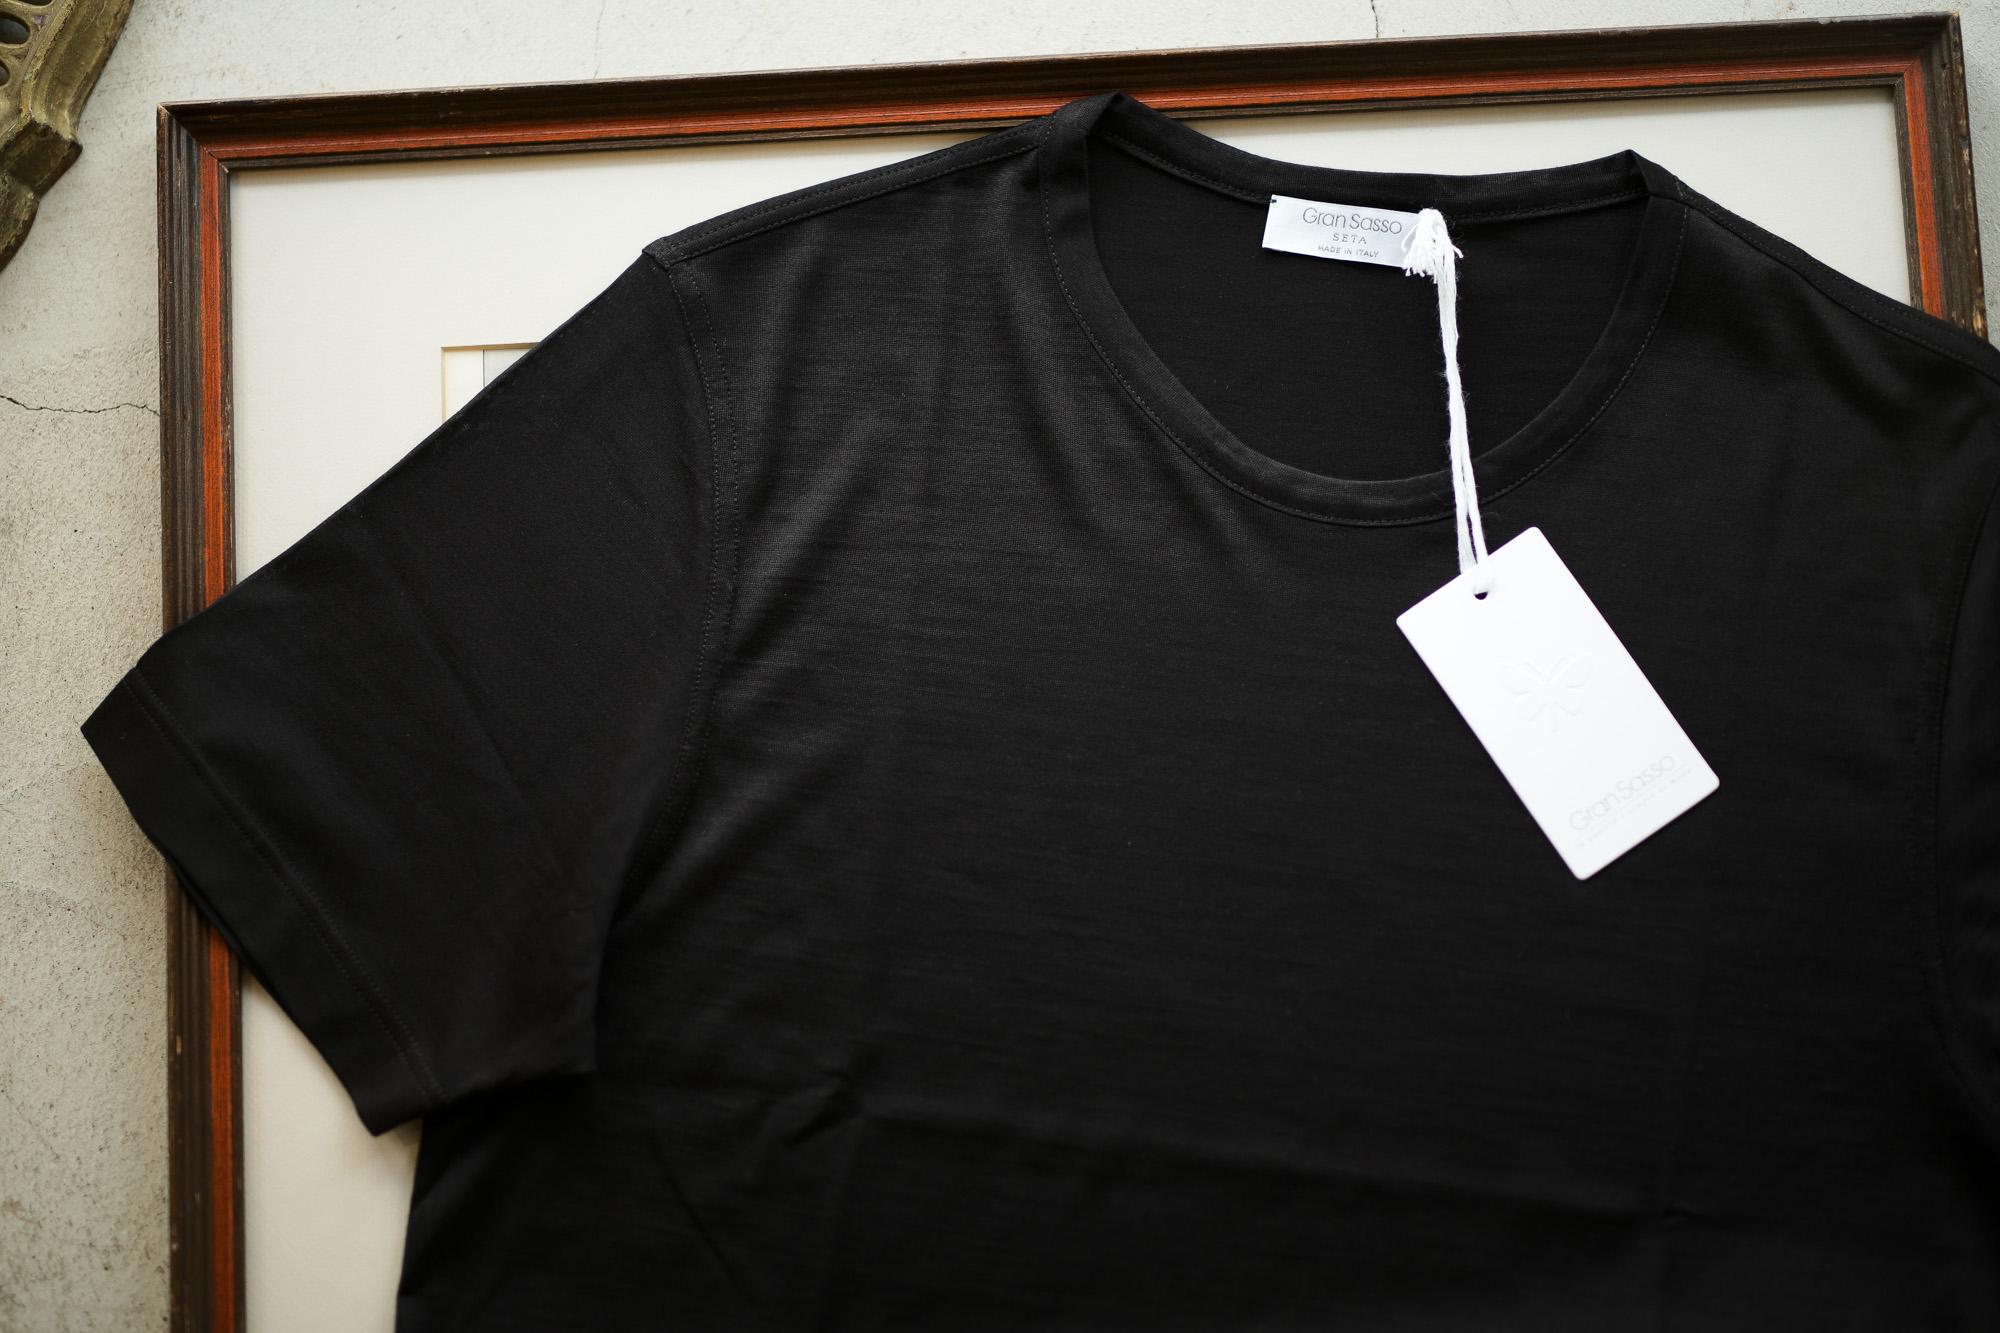 Gran Sasso (グランサッソ) Silk T-shirt (シルク Tシャツ) SETA (シルク 100%) ショートスリーブ シルク Tシャツ BLACK (ブラック・303) made in italy (イタリア製) 2019 春夏新作 gransasso 愛知 名古屋 altoediritto アルトエデリット